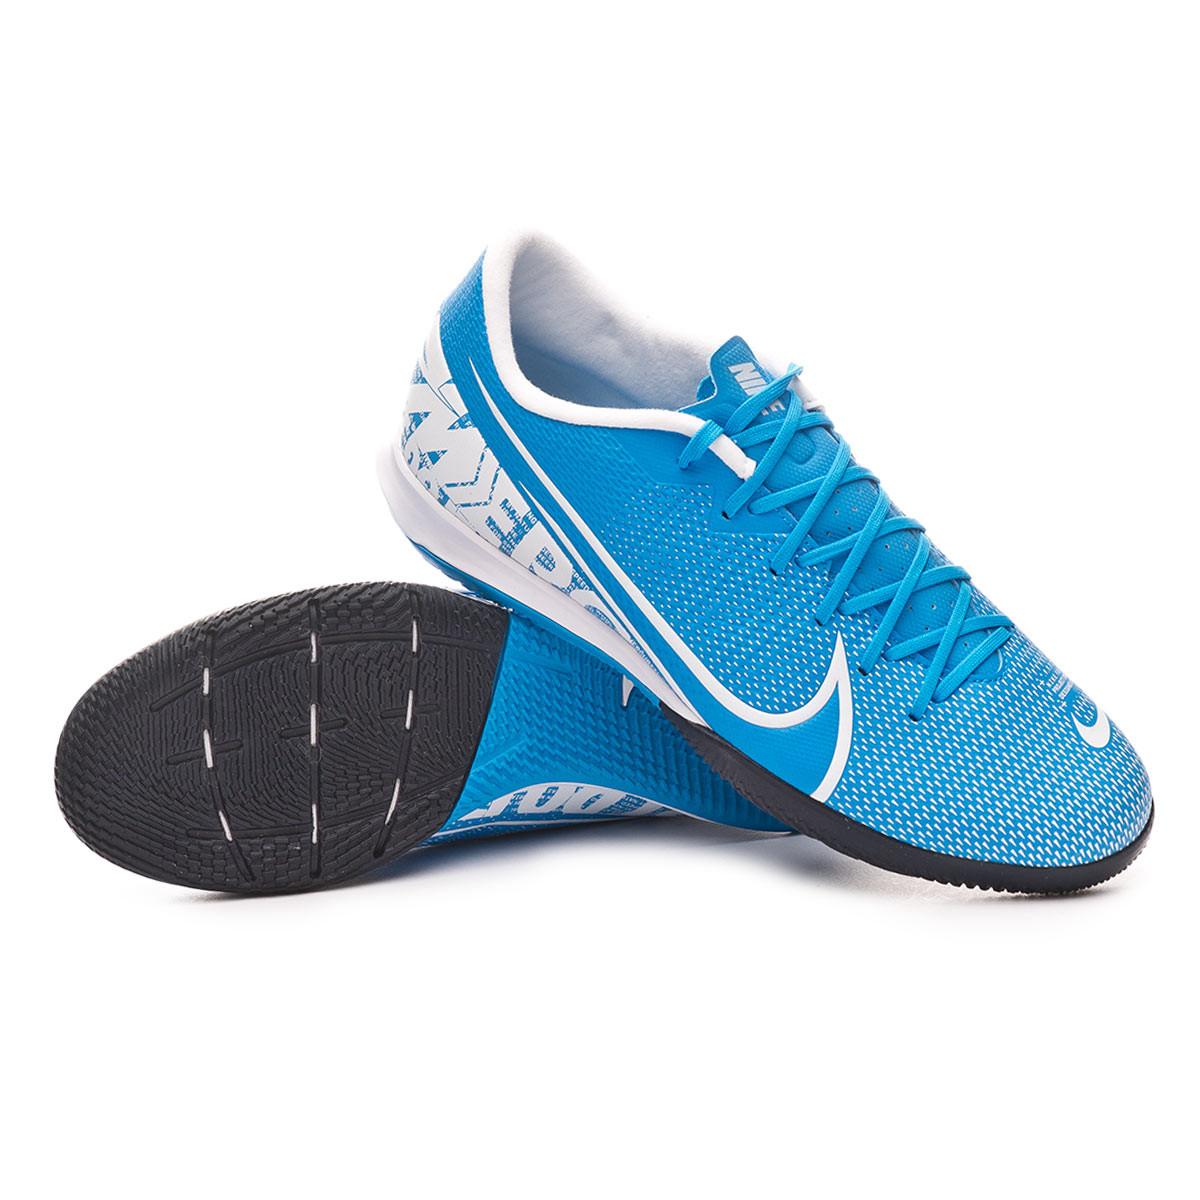 Predicar Subir Marcha atrás  Futsal Boot Nike Mercurial Vapor XIII Academy IC Blue hero-White-Obsidian -  Football store Fútbol Emotion